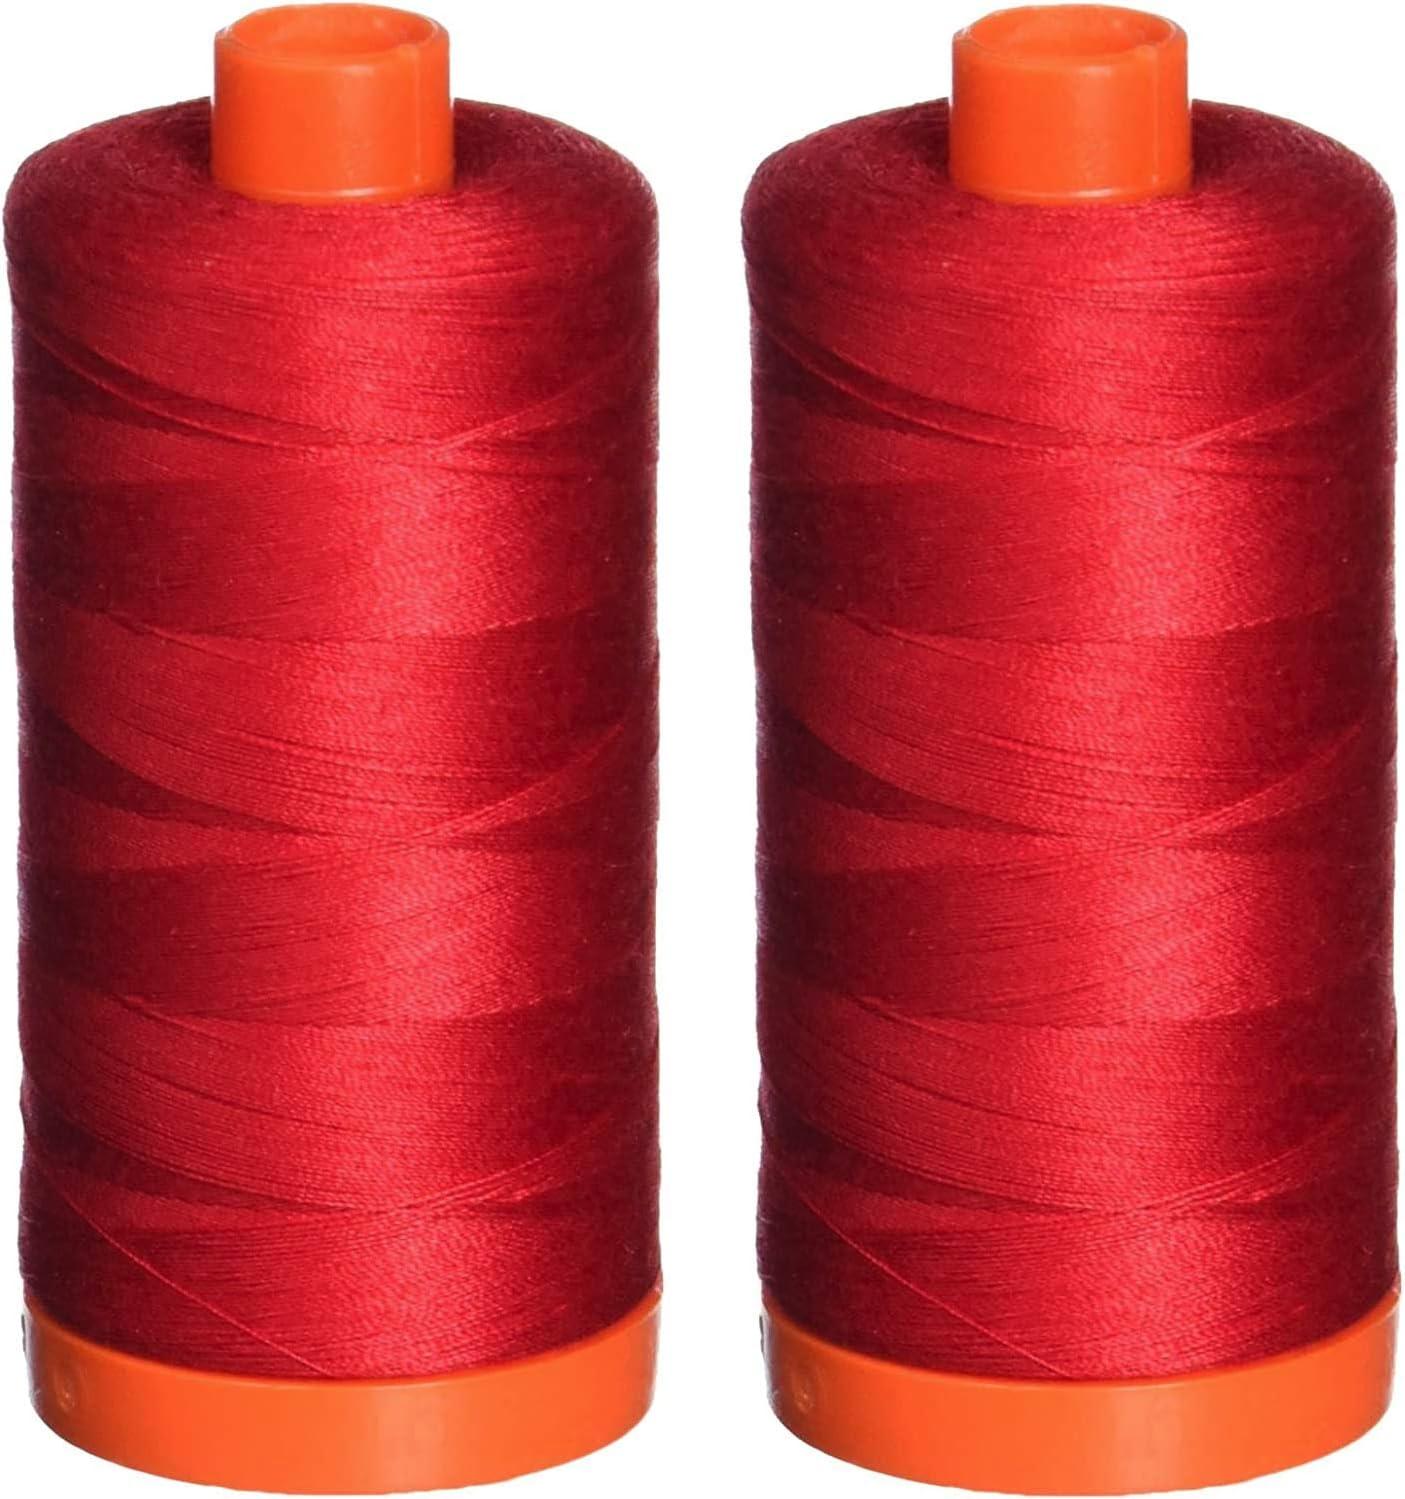 shopping Aurifil 50wt Mako Cotton Thread 1 - yards Ð Max 89% OFF A1050-2250 422 Red